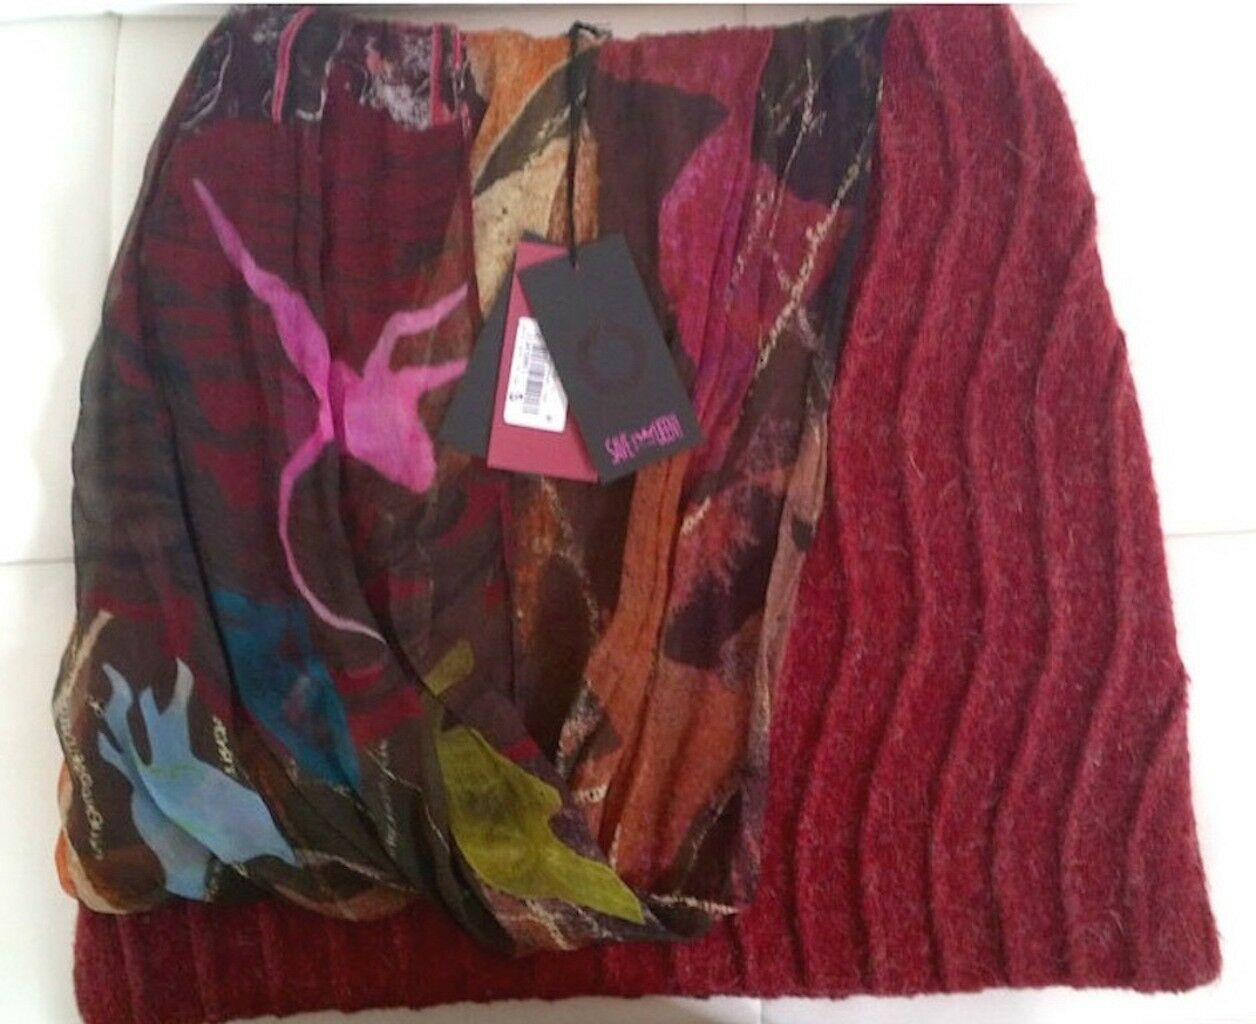 SAVE THE QUEEN   jupe réf 5150 - collection automne hiver 2014-2015 S BORDEAUXSA